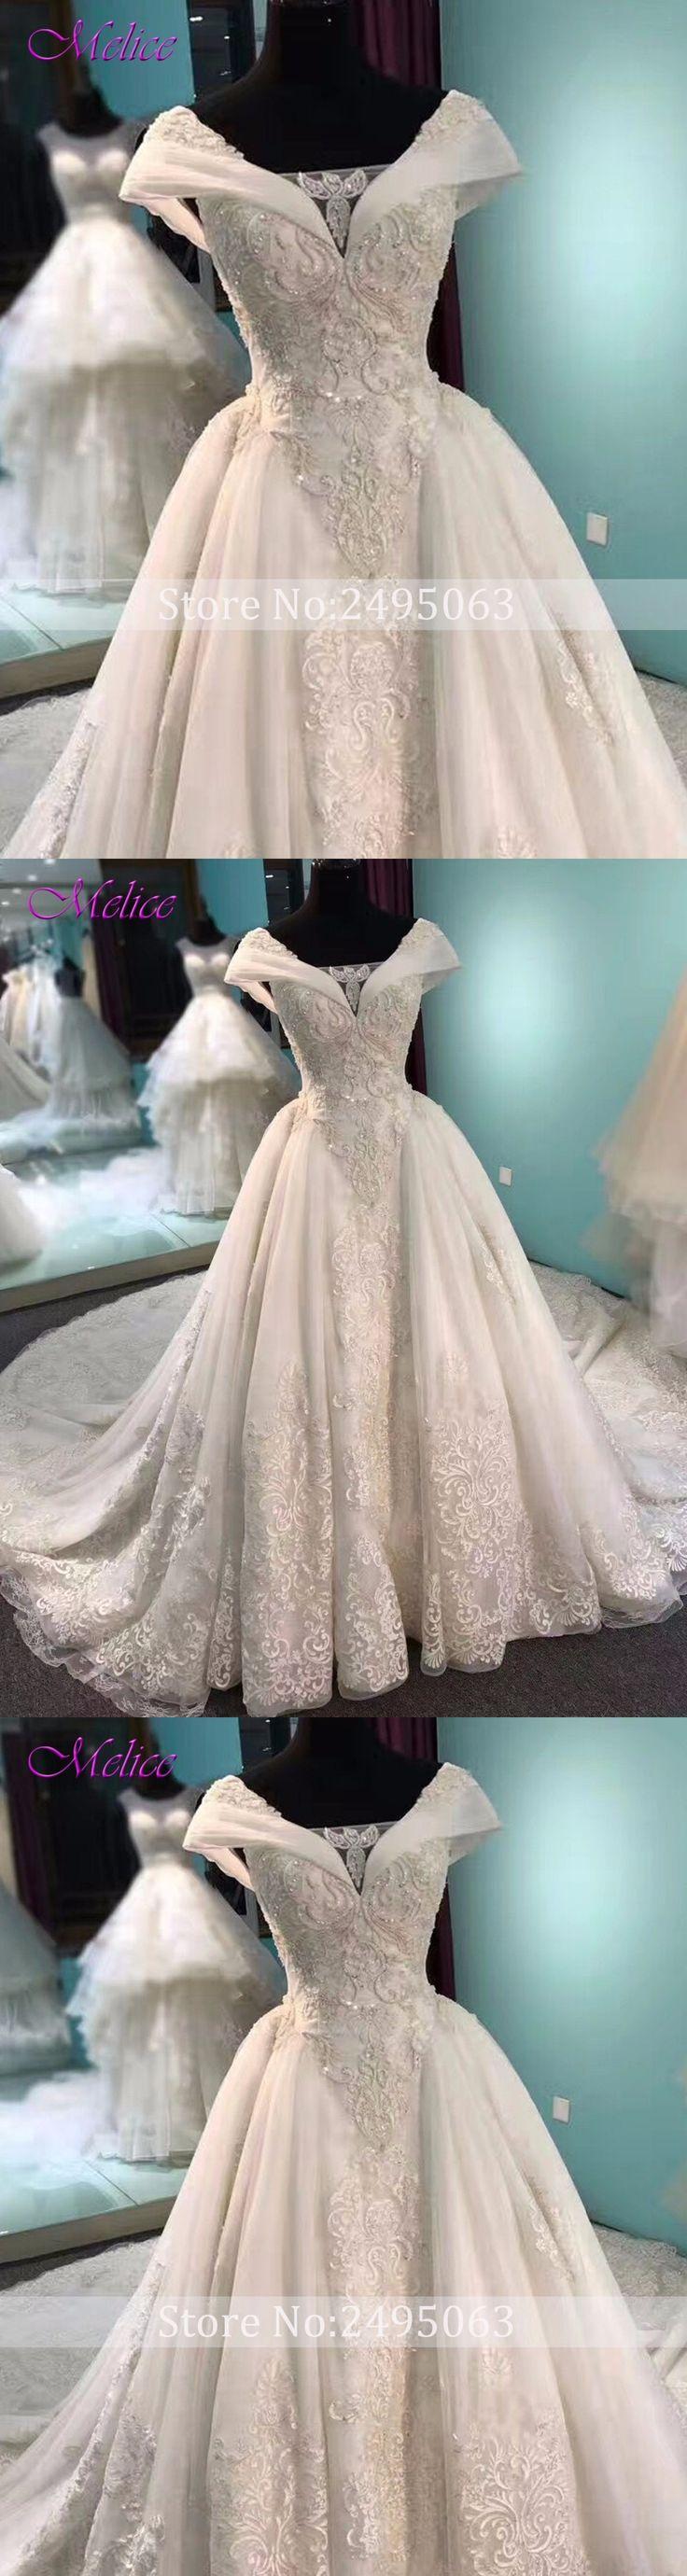 Melice Glamorous Appliques Chapel Train A-Line Wedding Dress 2018 Luxury  Beaded Cap Sleeve Bride a89b7d59e482